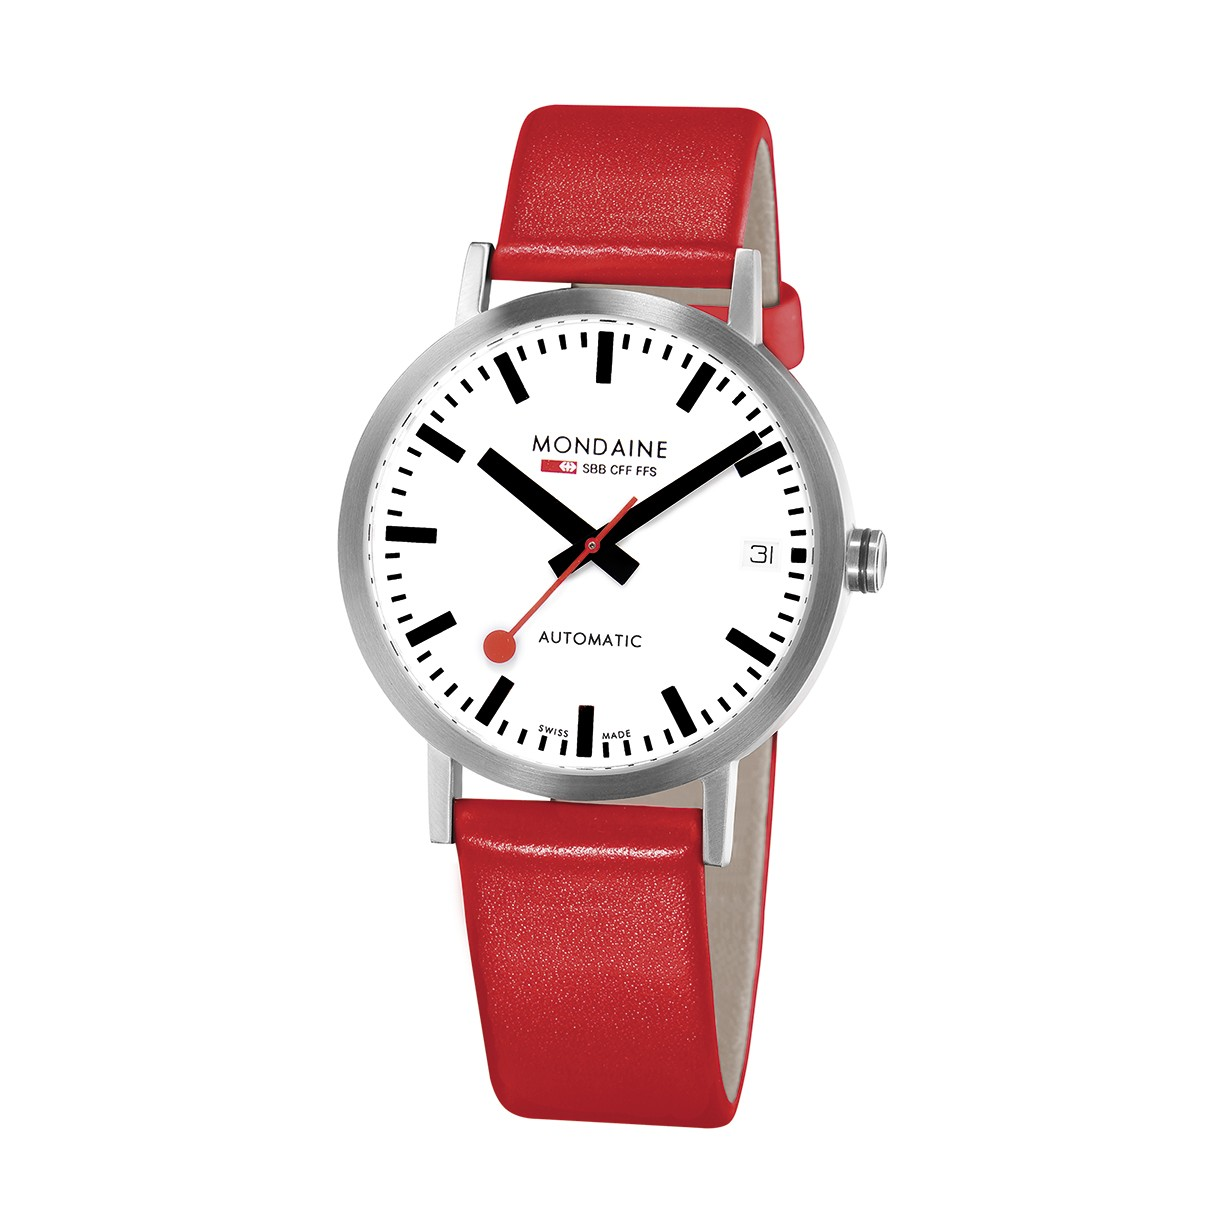 Mondaine swiss watch Classic Automatic A128.30008.16SBC